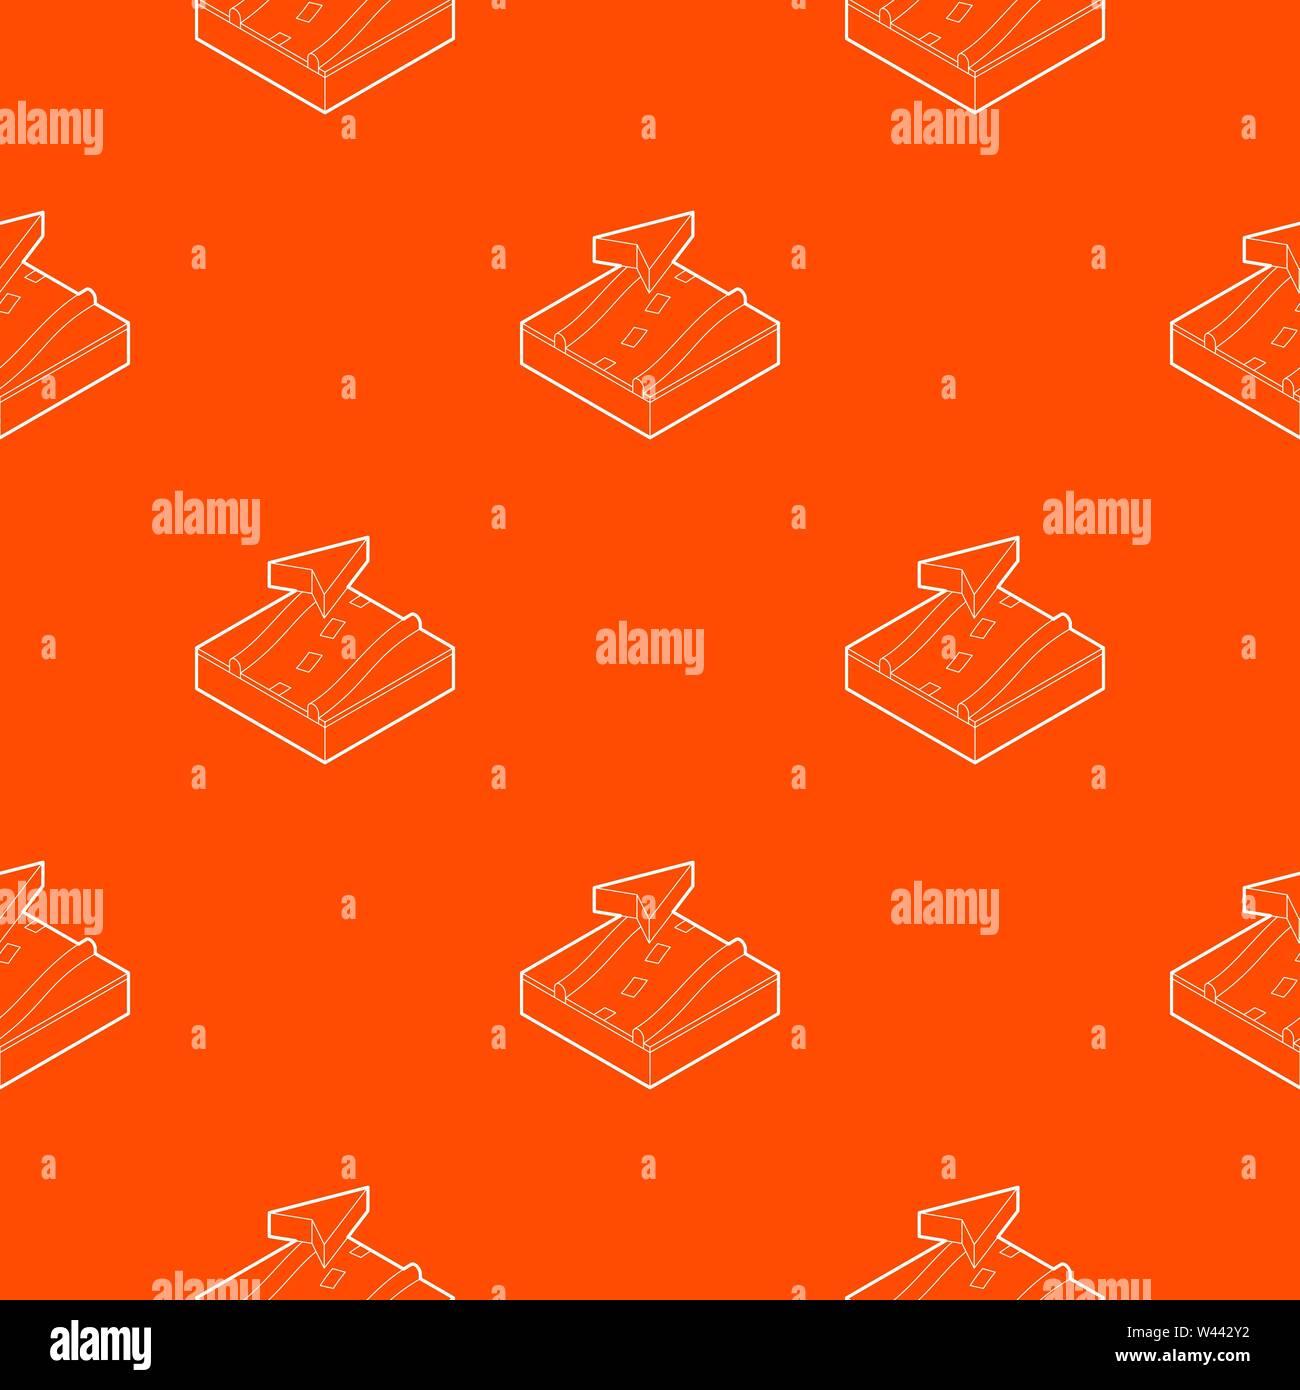 Navigation pattern vector orange - Stock Vector